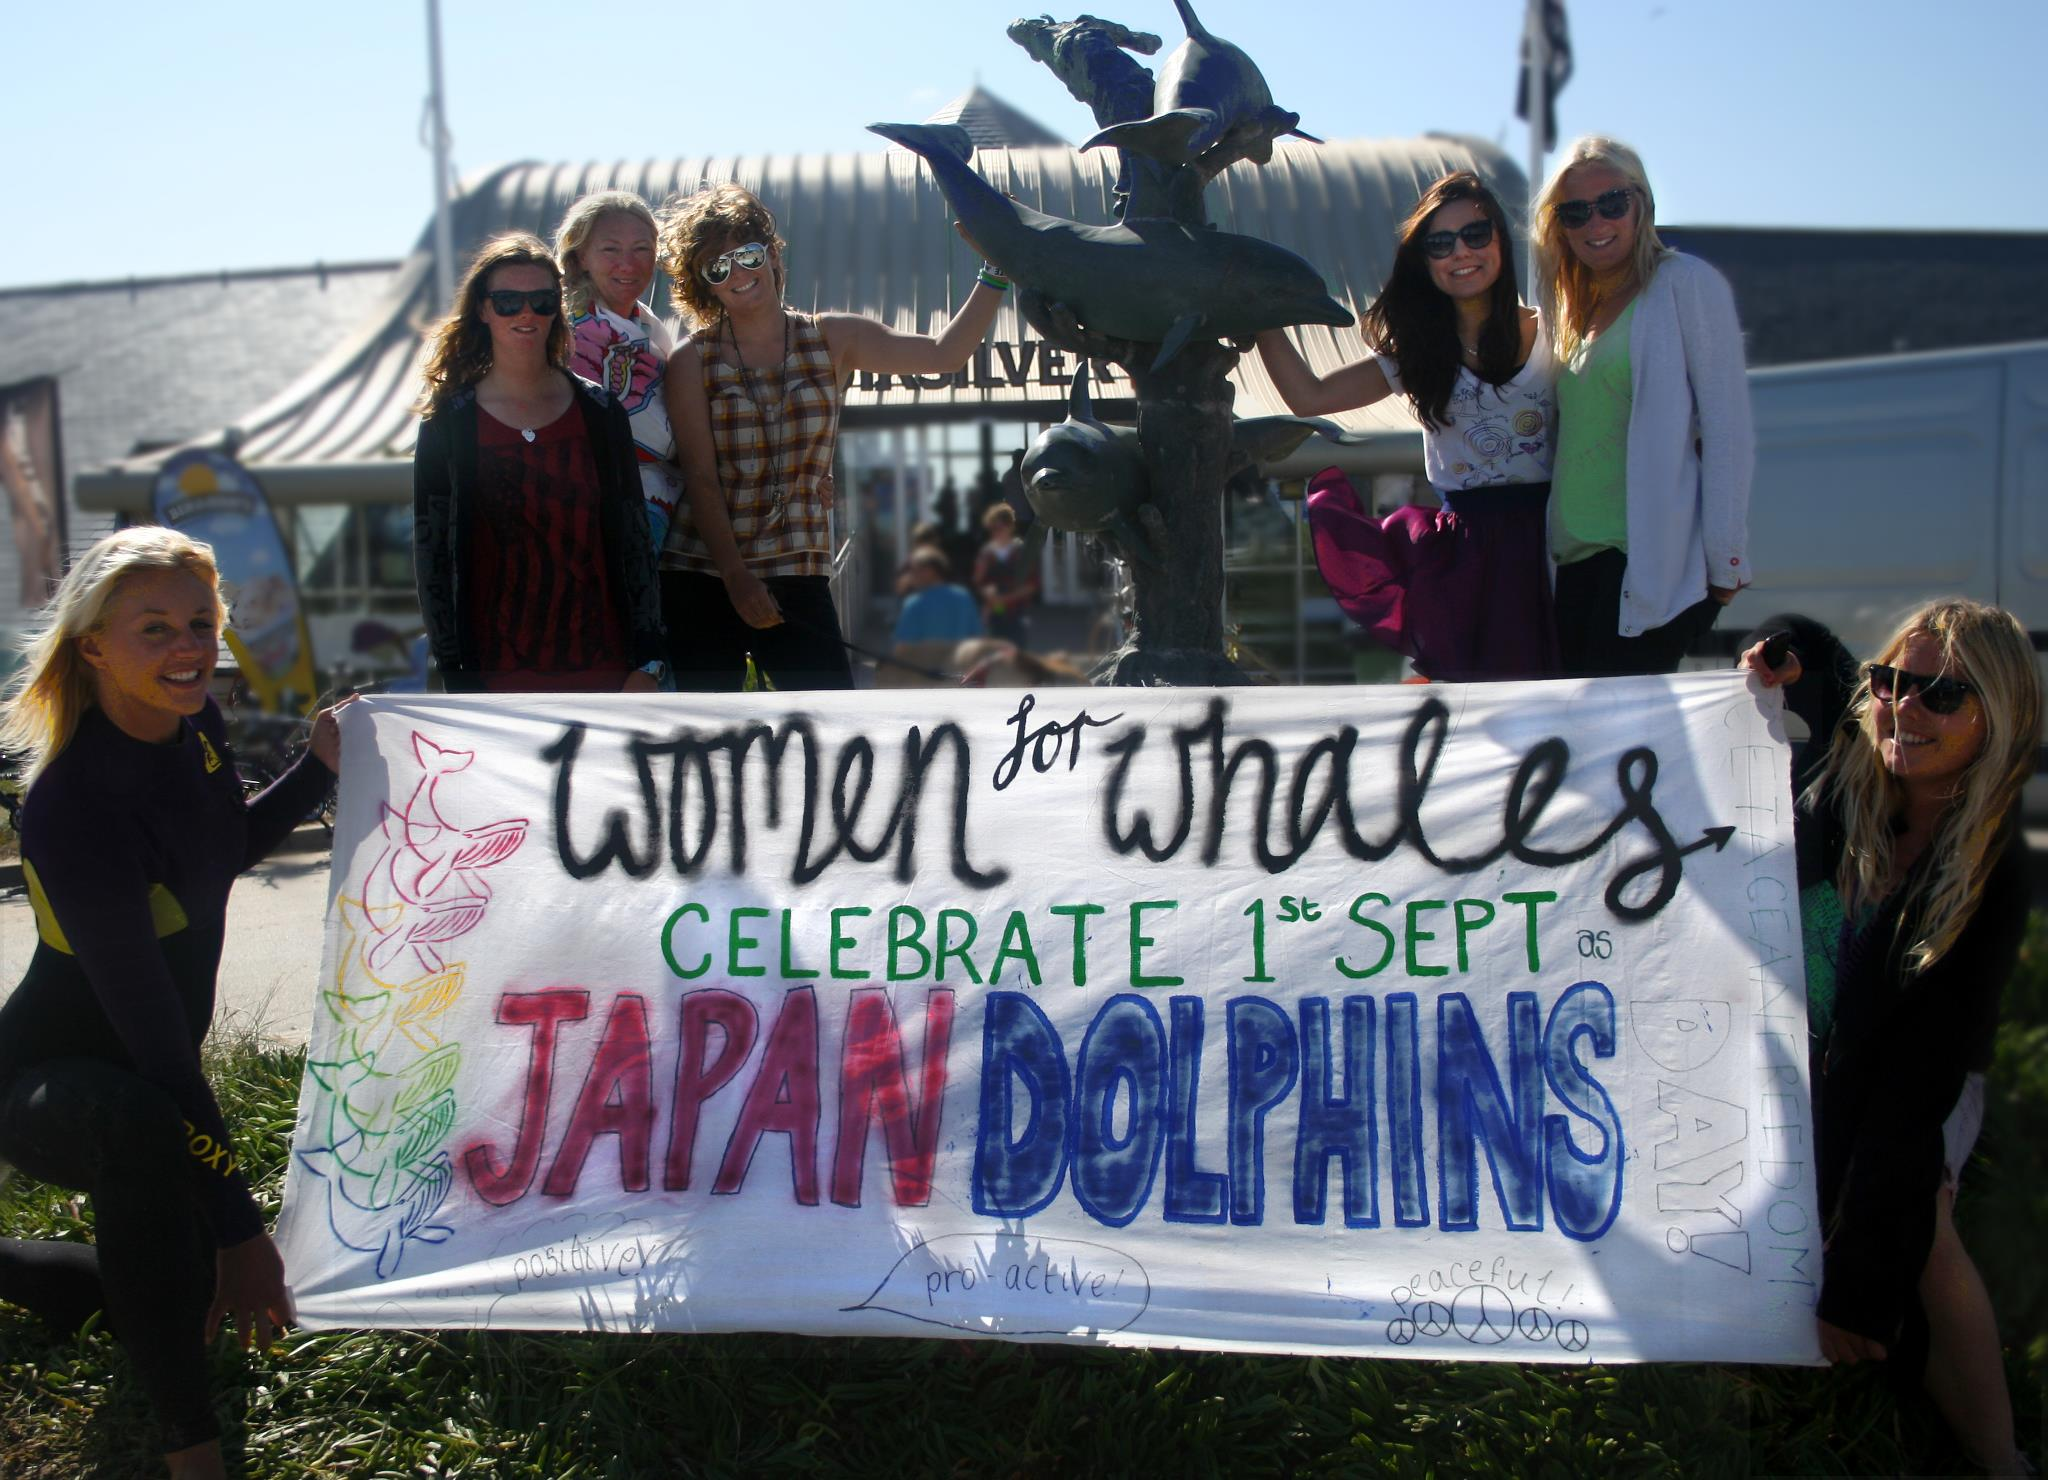 japan dolphin day.jpg